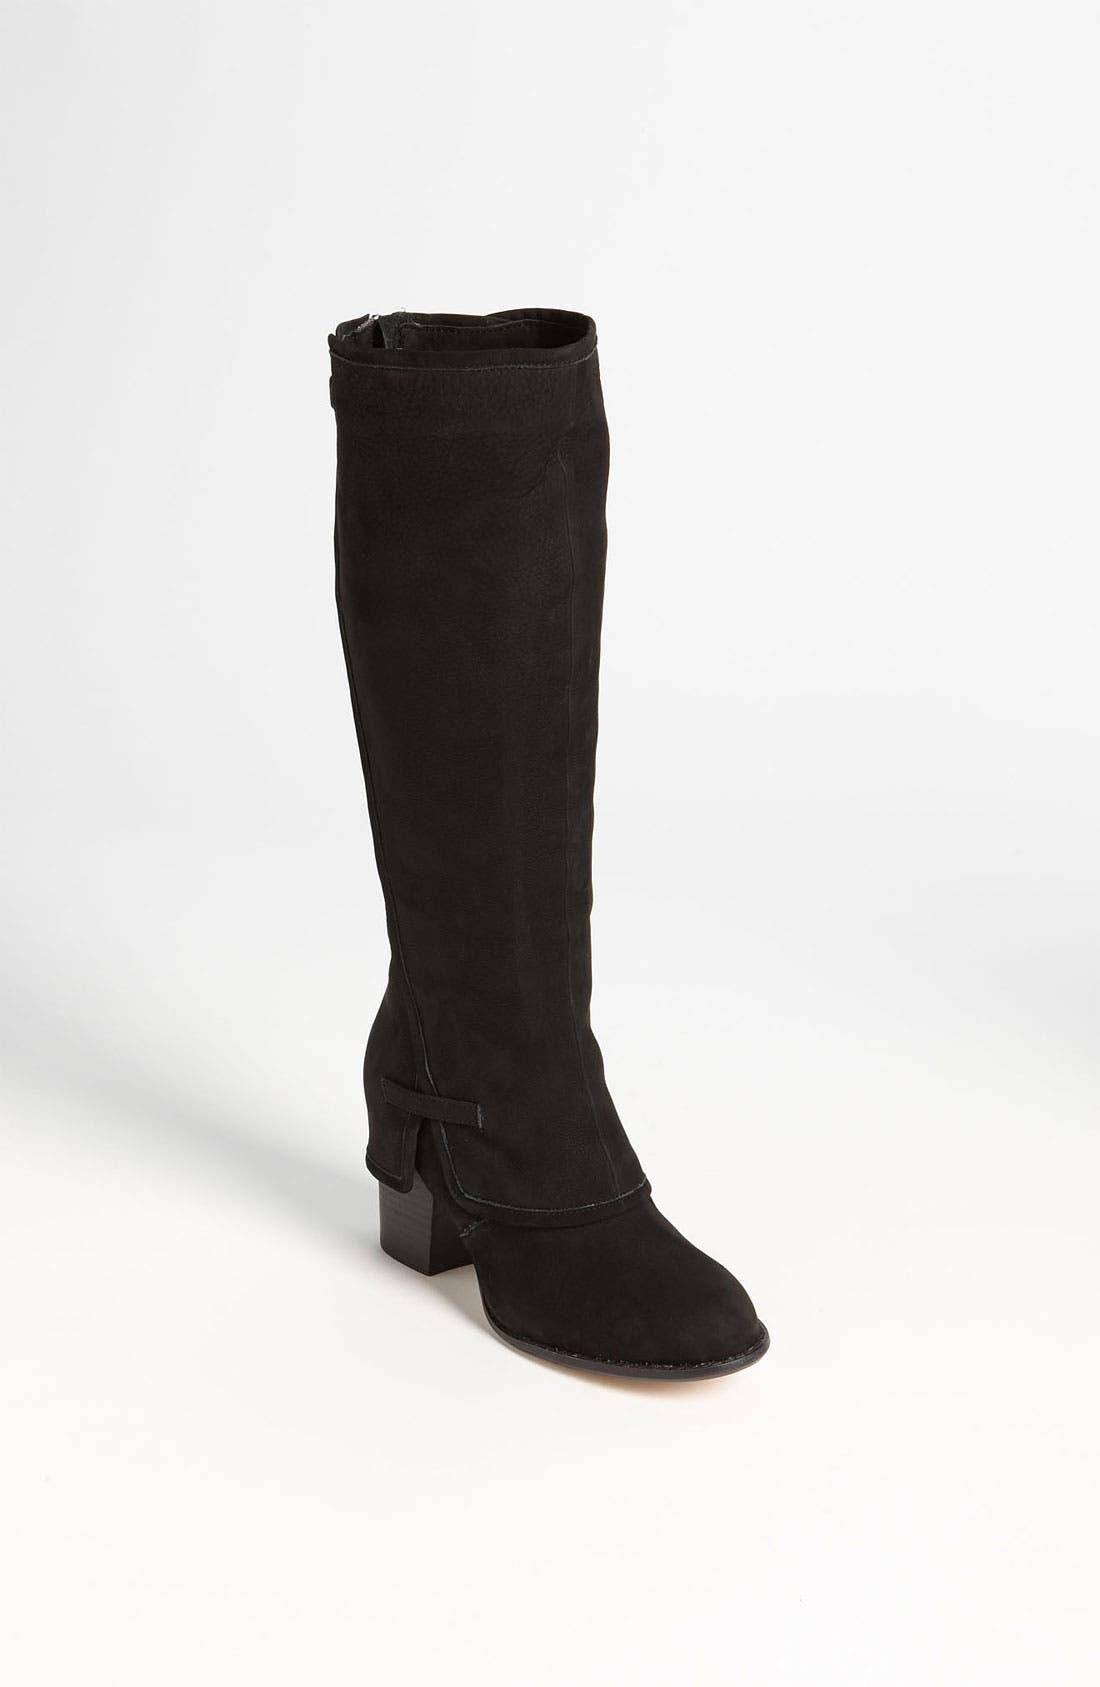 Alternate Image 1 Selected - Splendid 'Lima' Boot